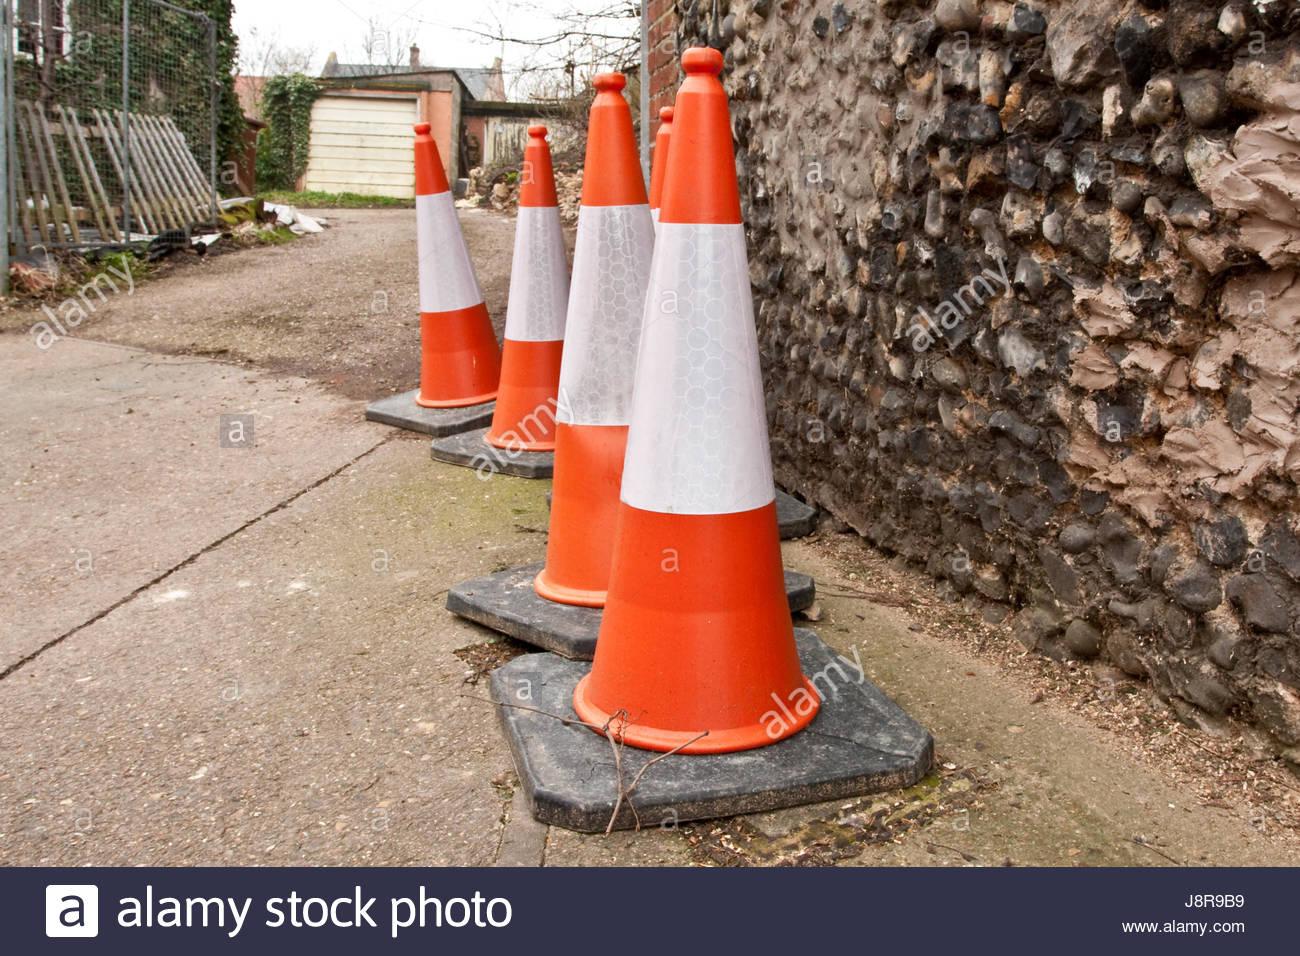 object, stone, four, rock, concrete, wall, standing, shape, orange, - Stock Image